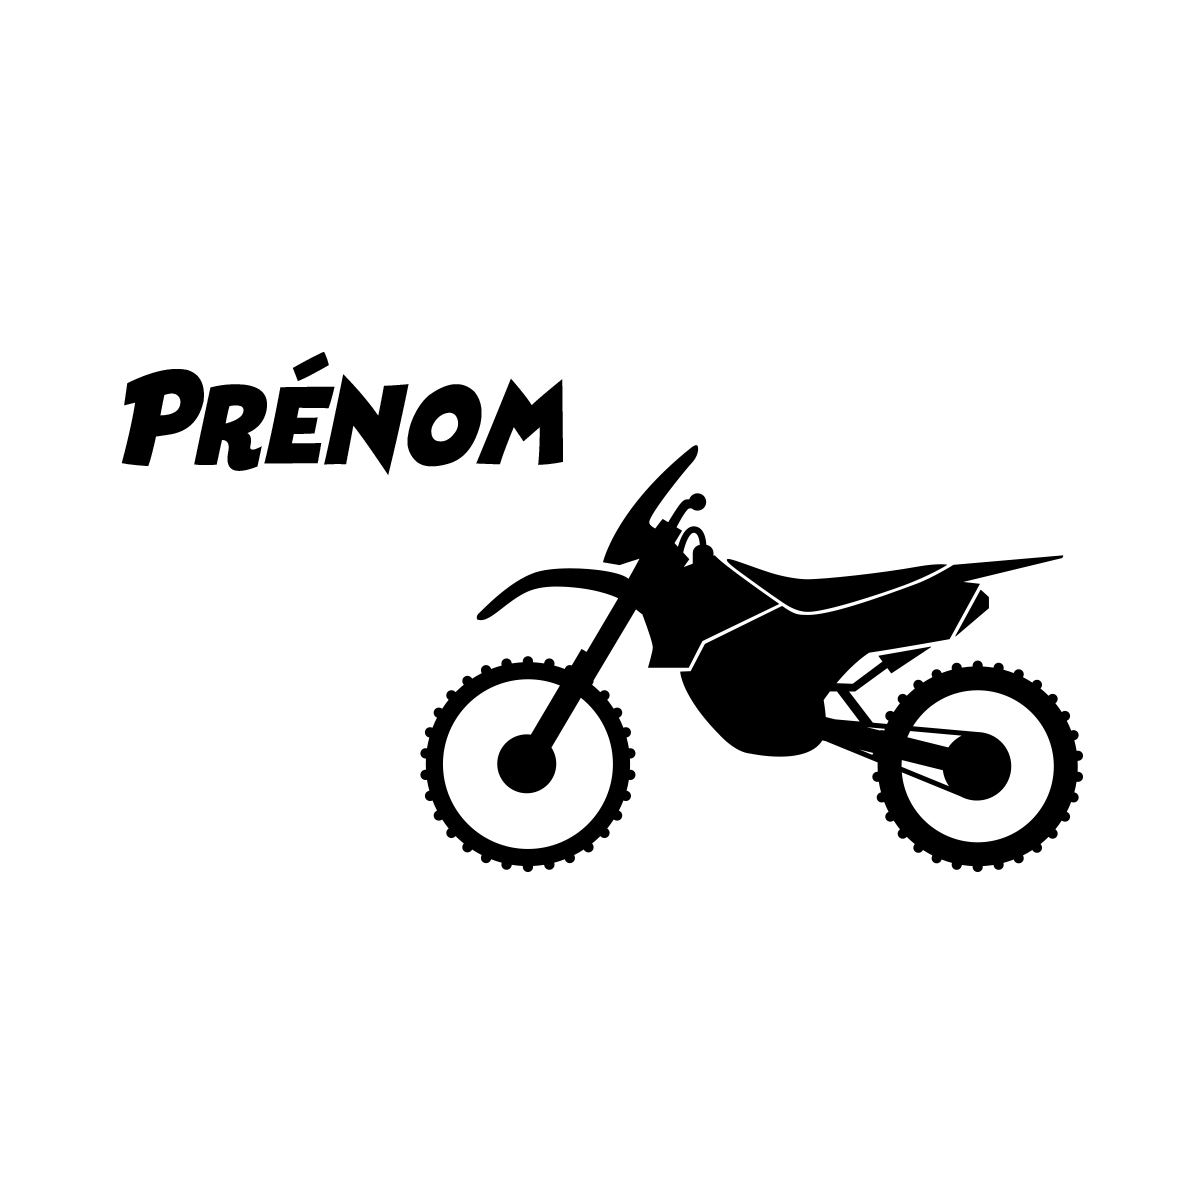 Stickers muraux prénom sticker prénom personnalisable et sa moto ambiance sticker com